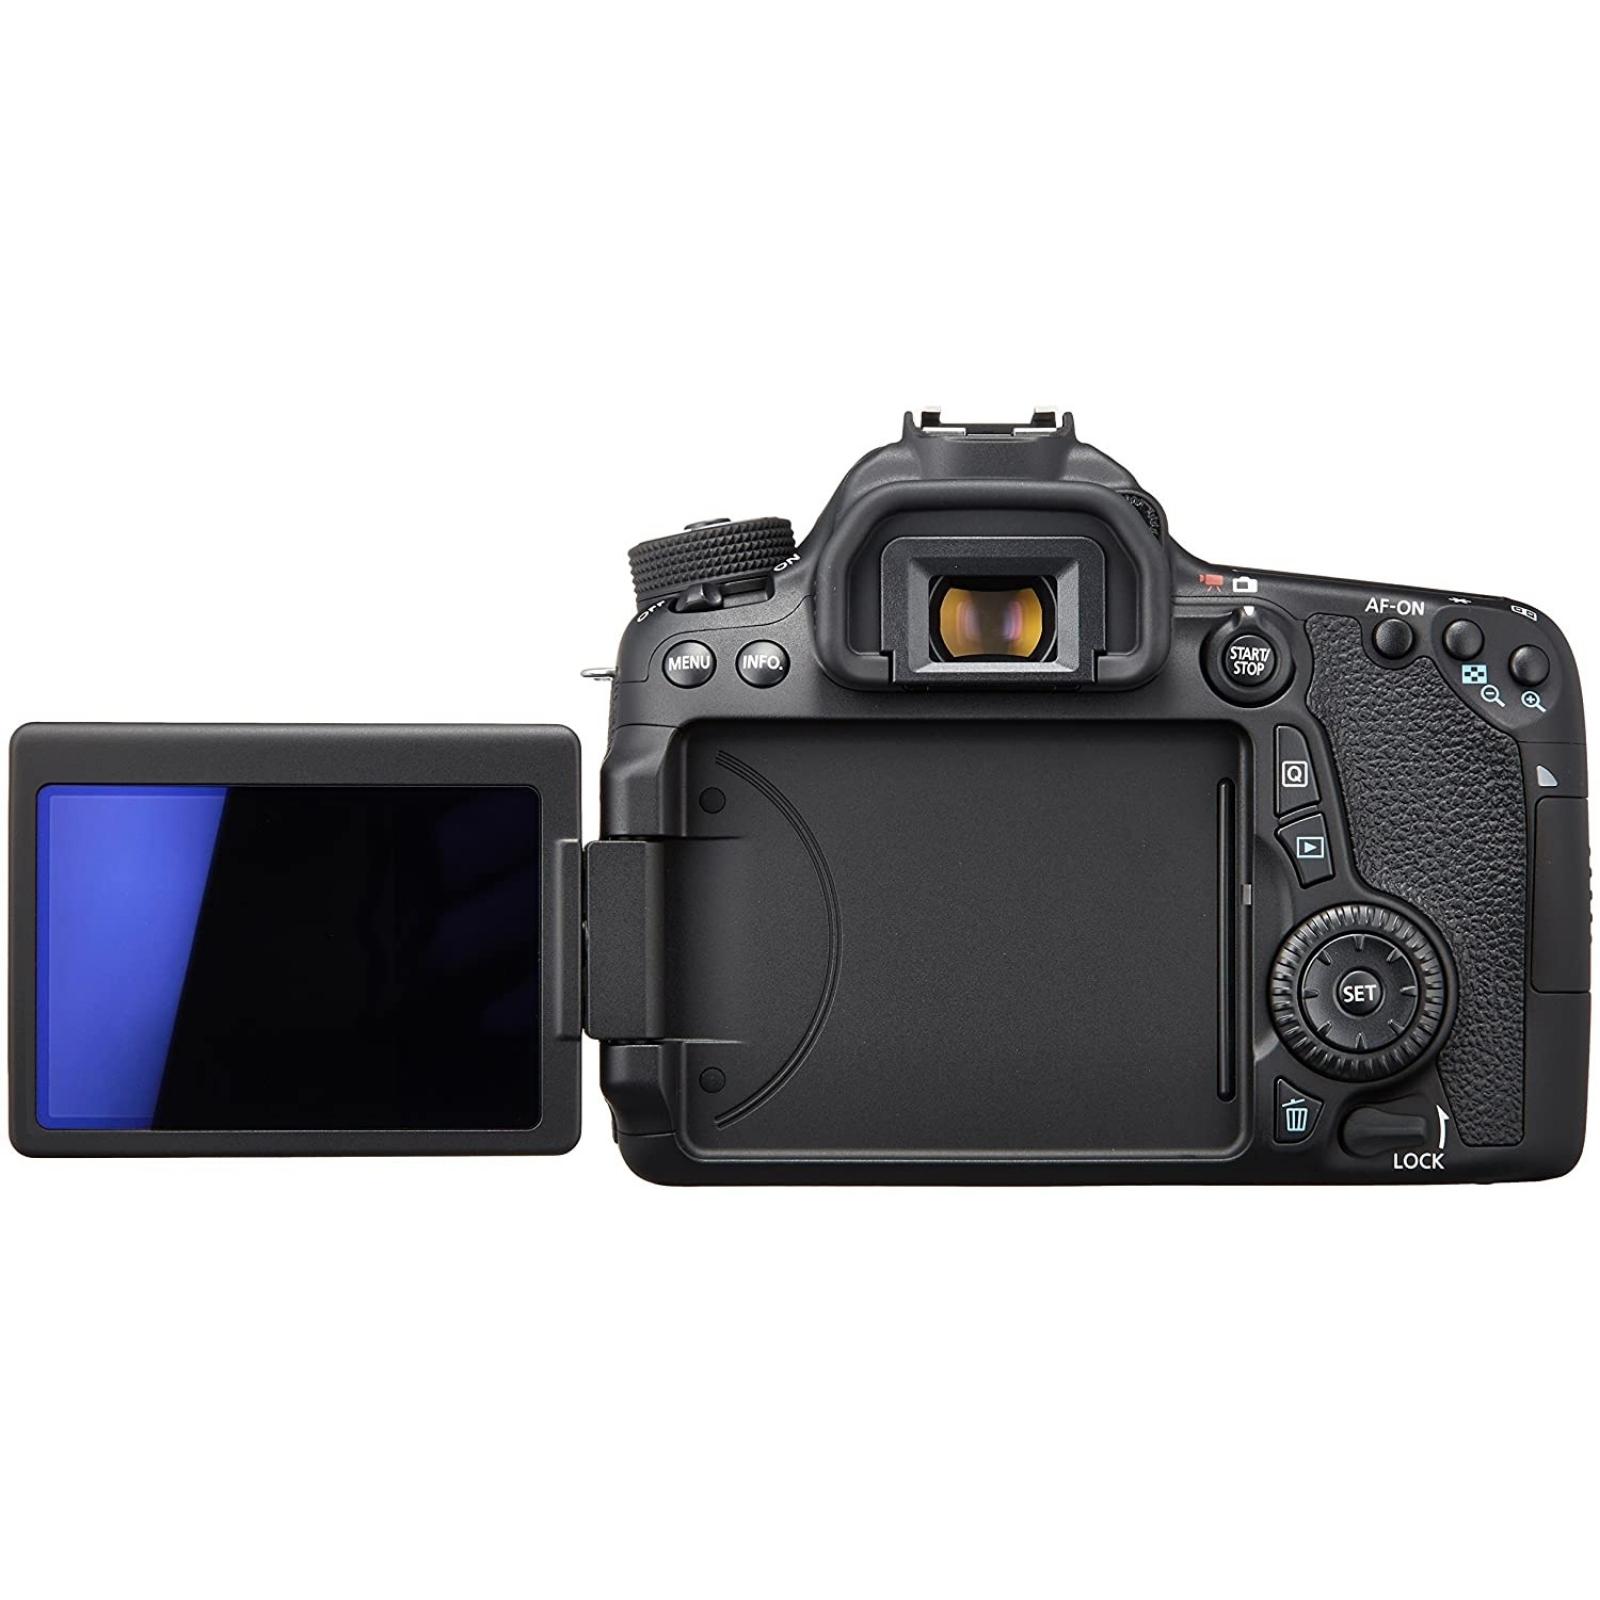 Canon キヤノン デジタル一眼レフカメラ EOS Kiss X7i ボディ ブラック EOSKISSX7I 新品